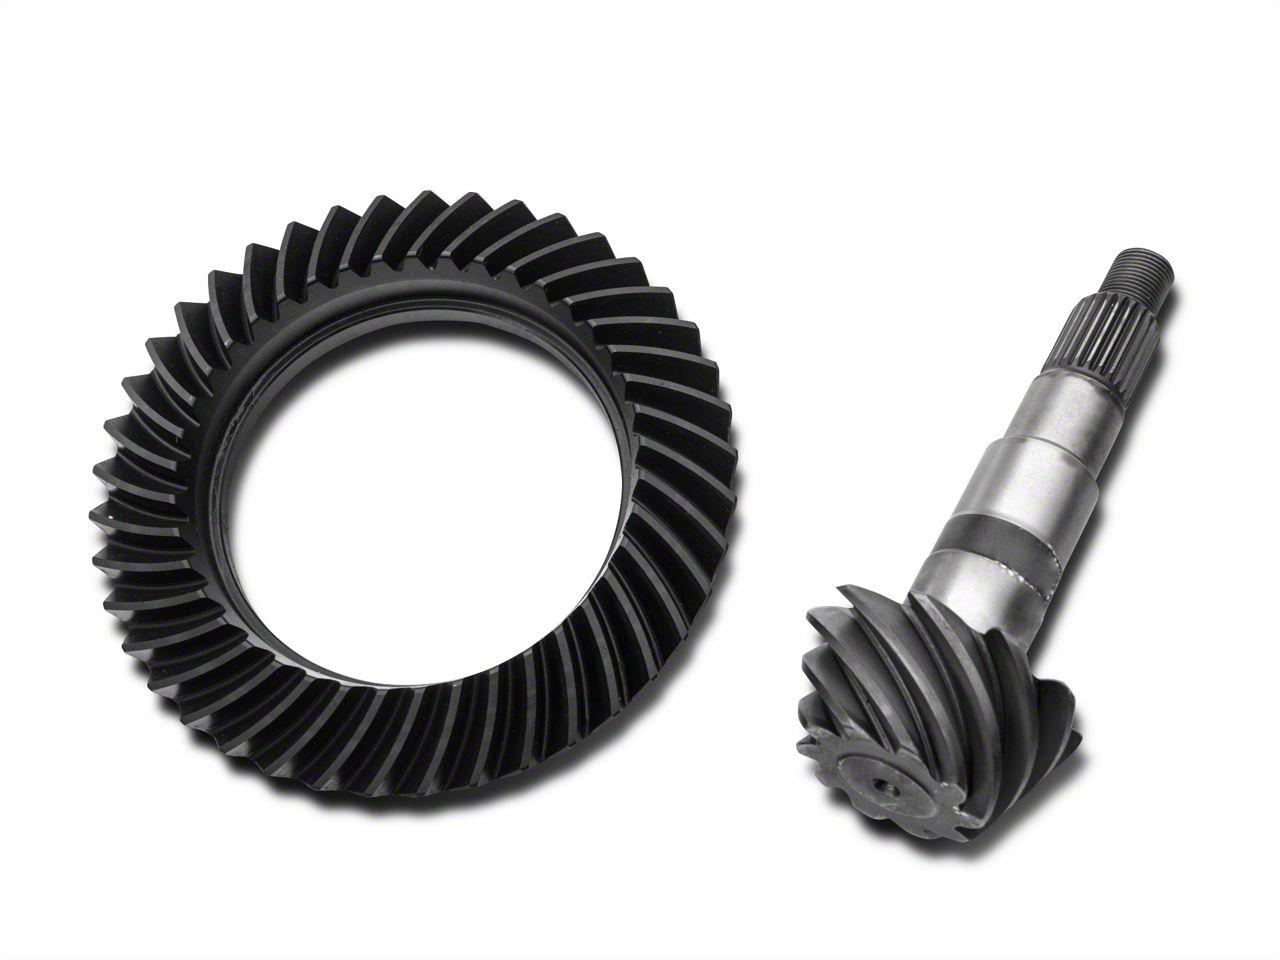 Yukon Gear Dana 44 Rear Ring Gear and Pinion Kit - 4.11 Gears (07-18 Jeep Wrangler JK)